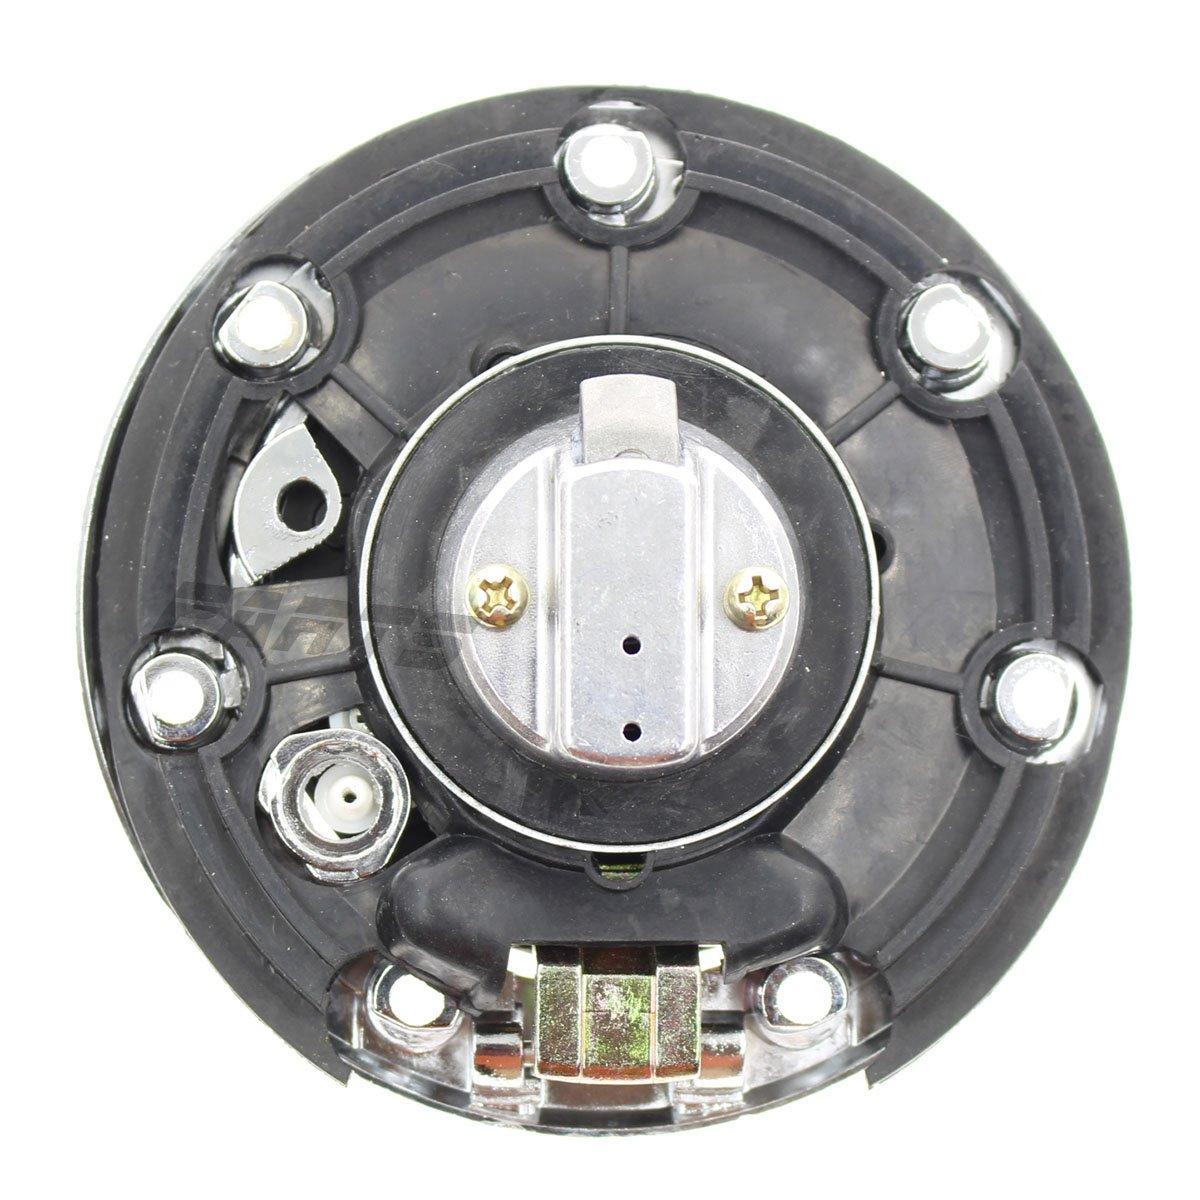 Key Switch Wire Harness To Ninja Zx7r Wiring Library